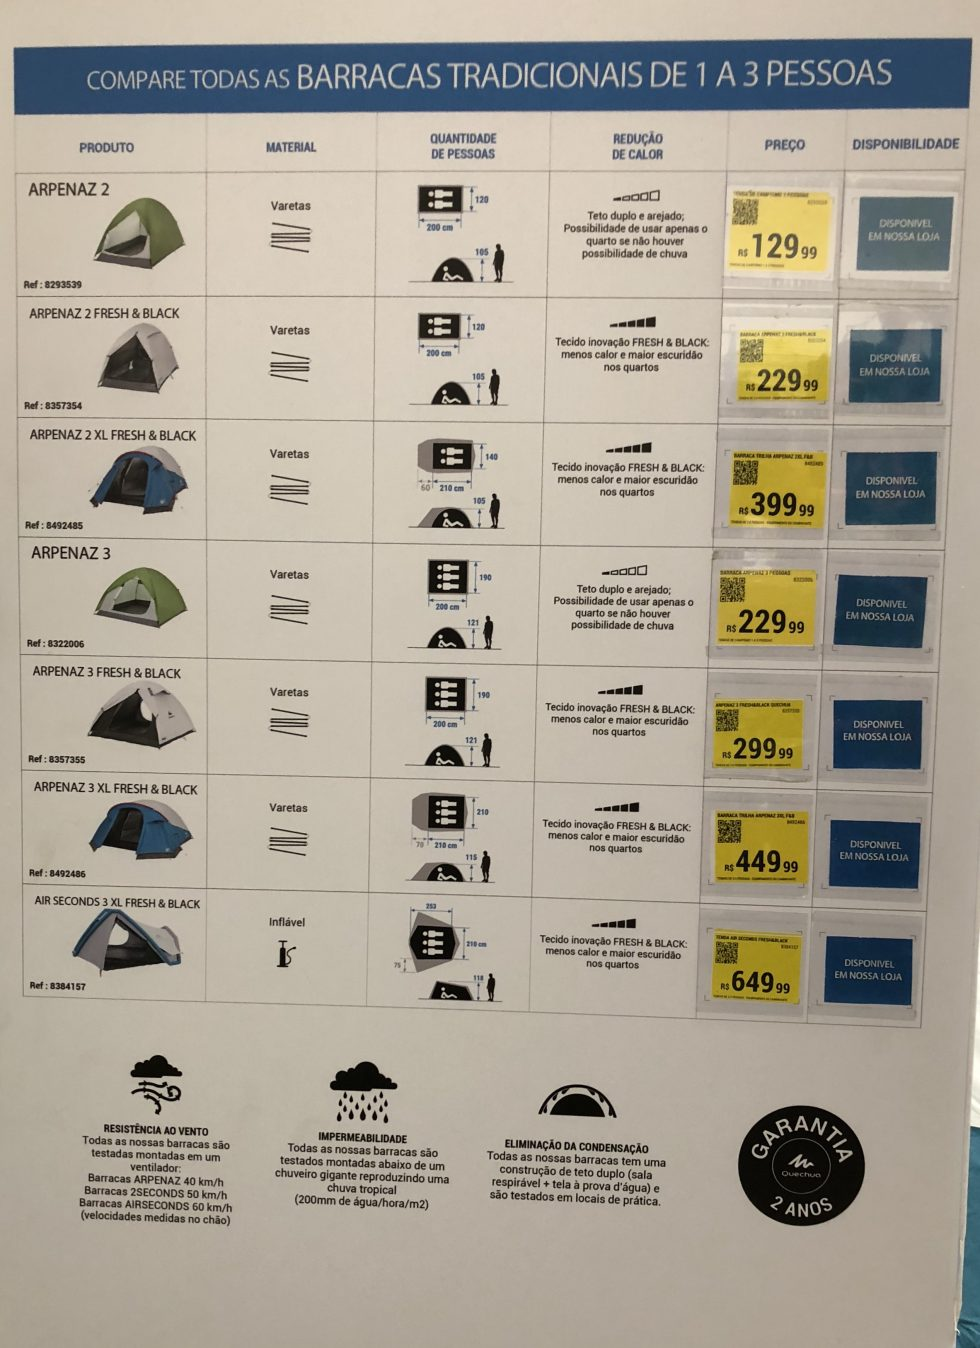 140a3341f qual tipo de barraca   tenda comprar 2-seconds varetas ou sistema de ar